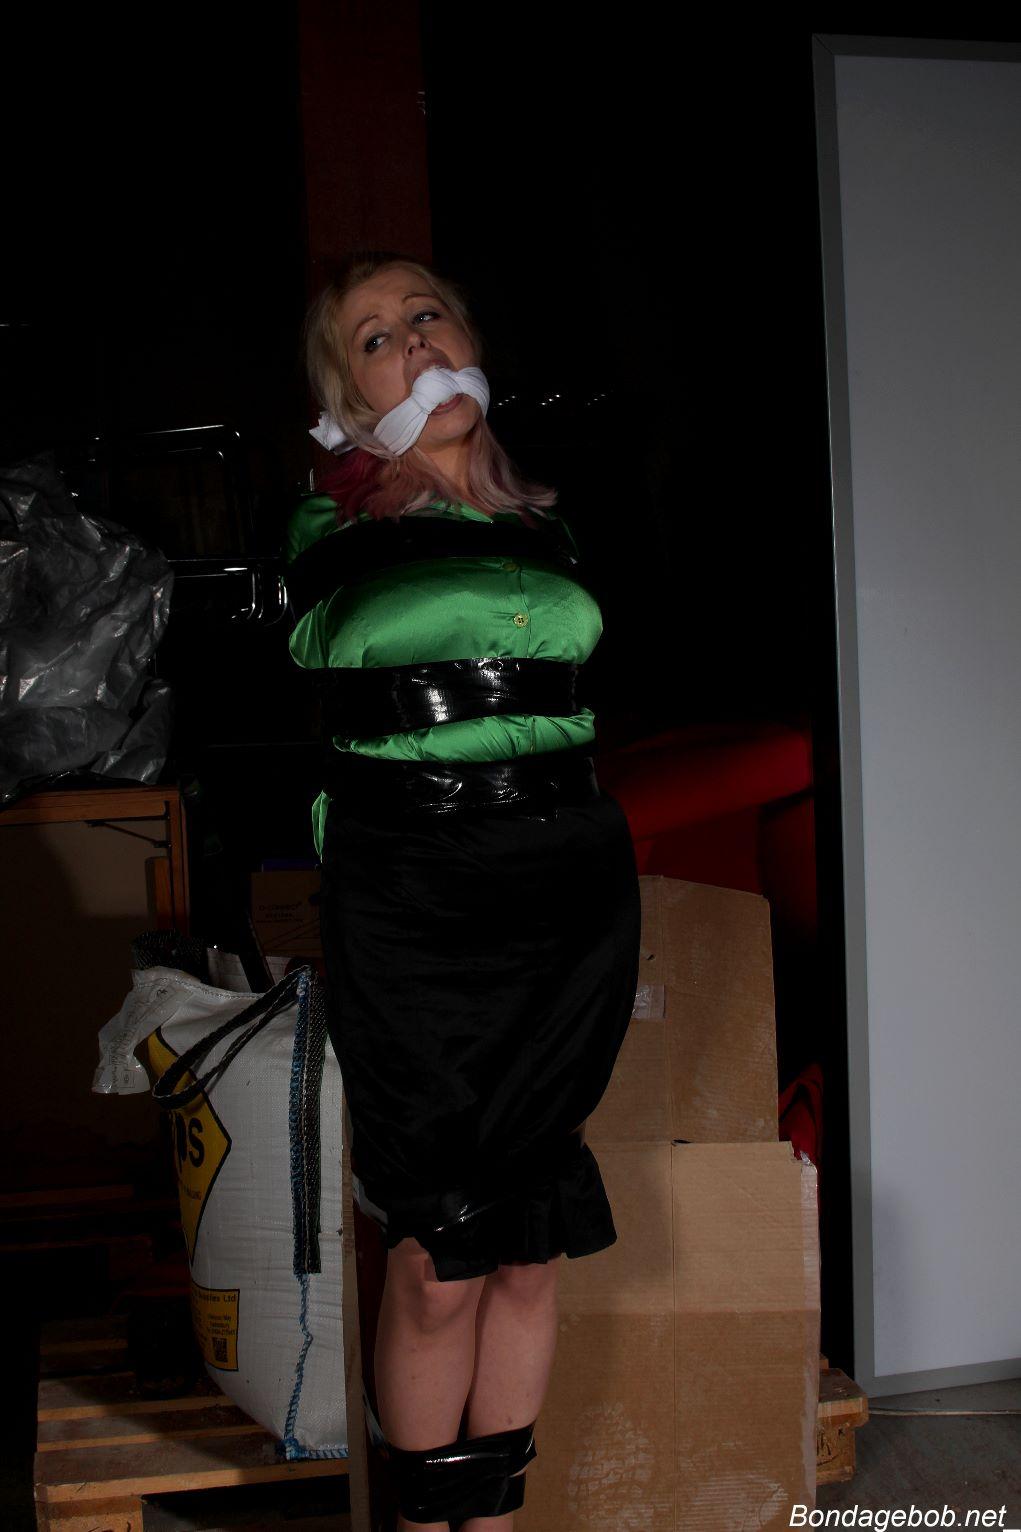 Temptress Kate in bondage.